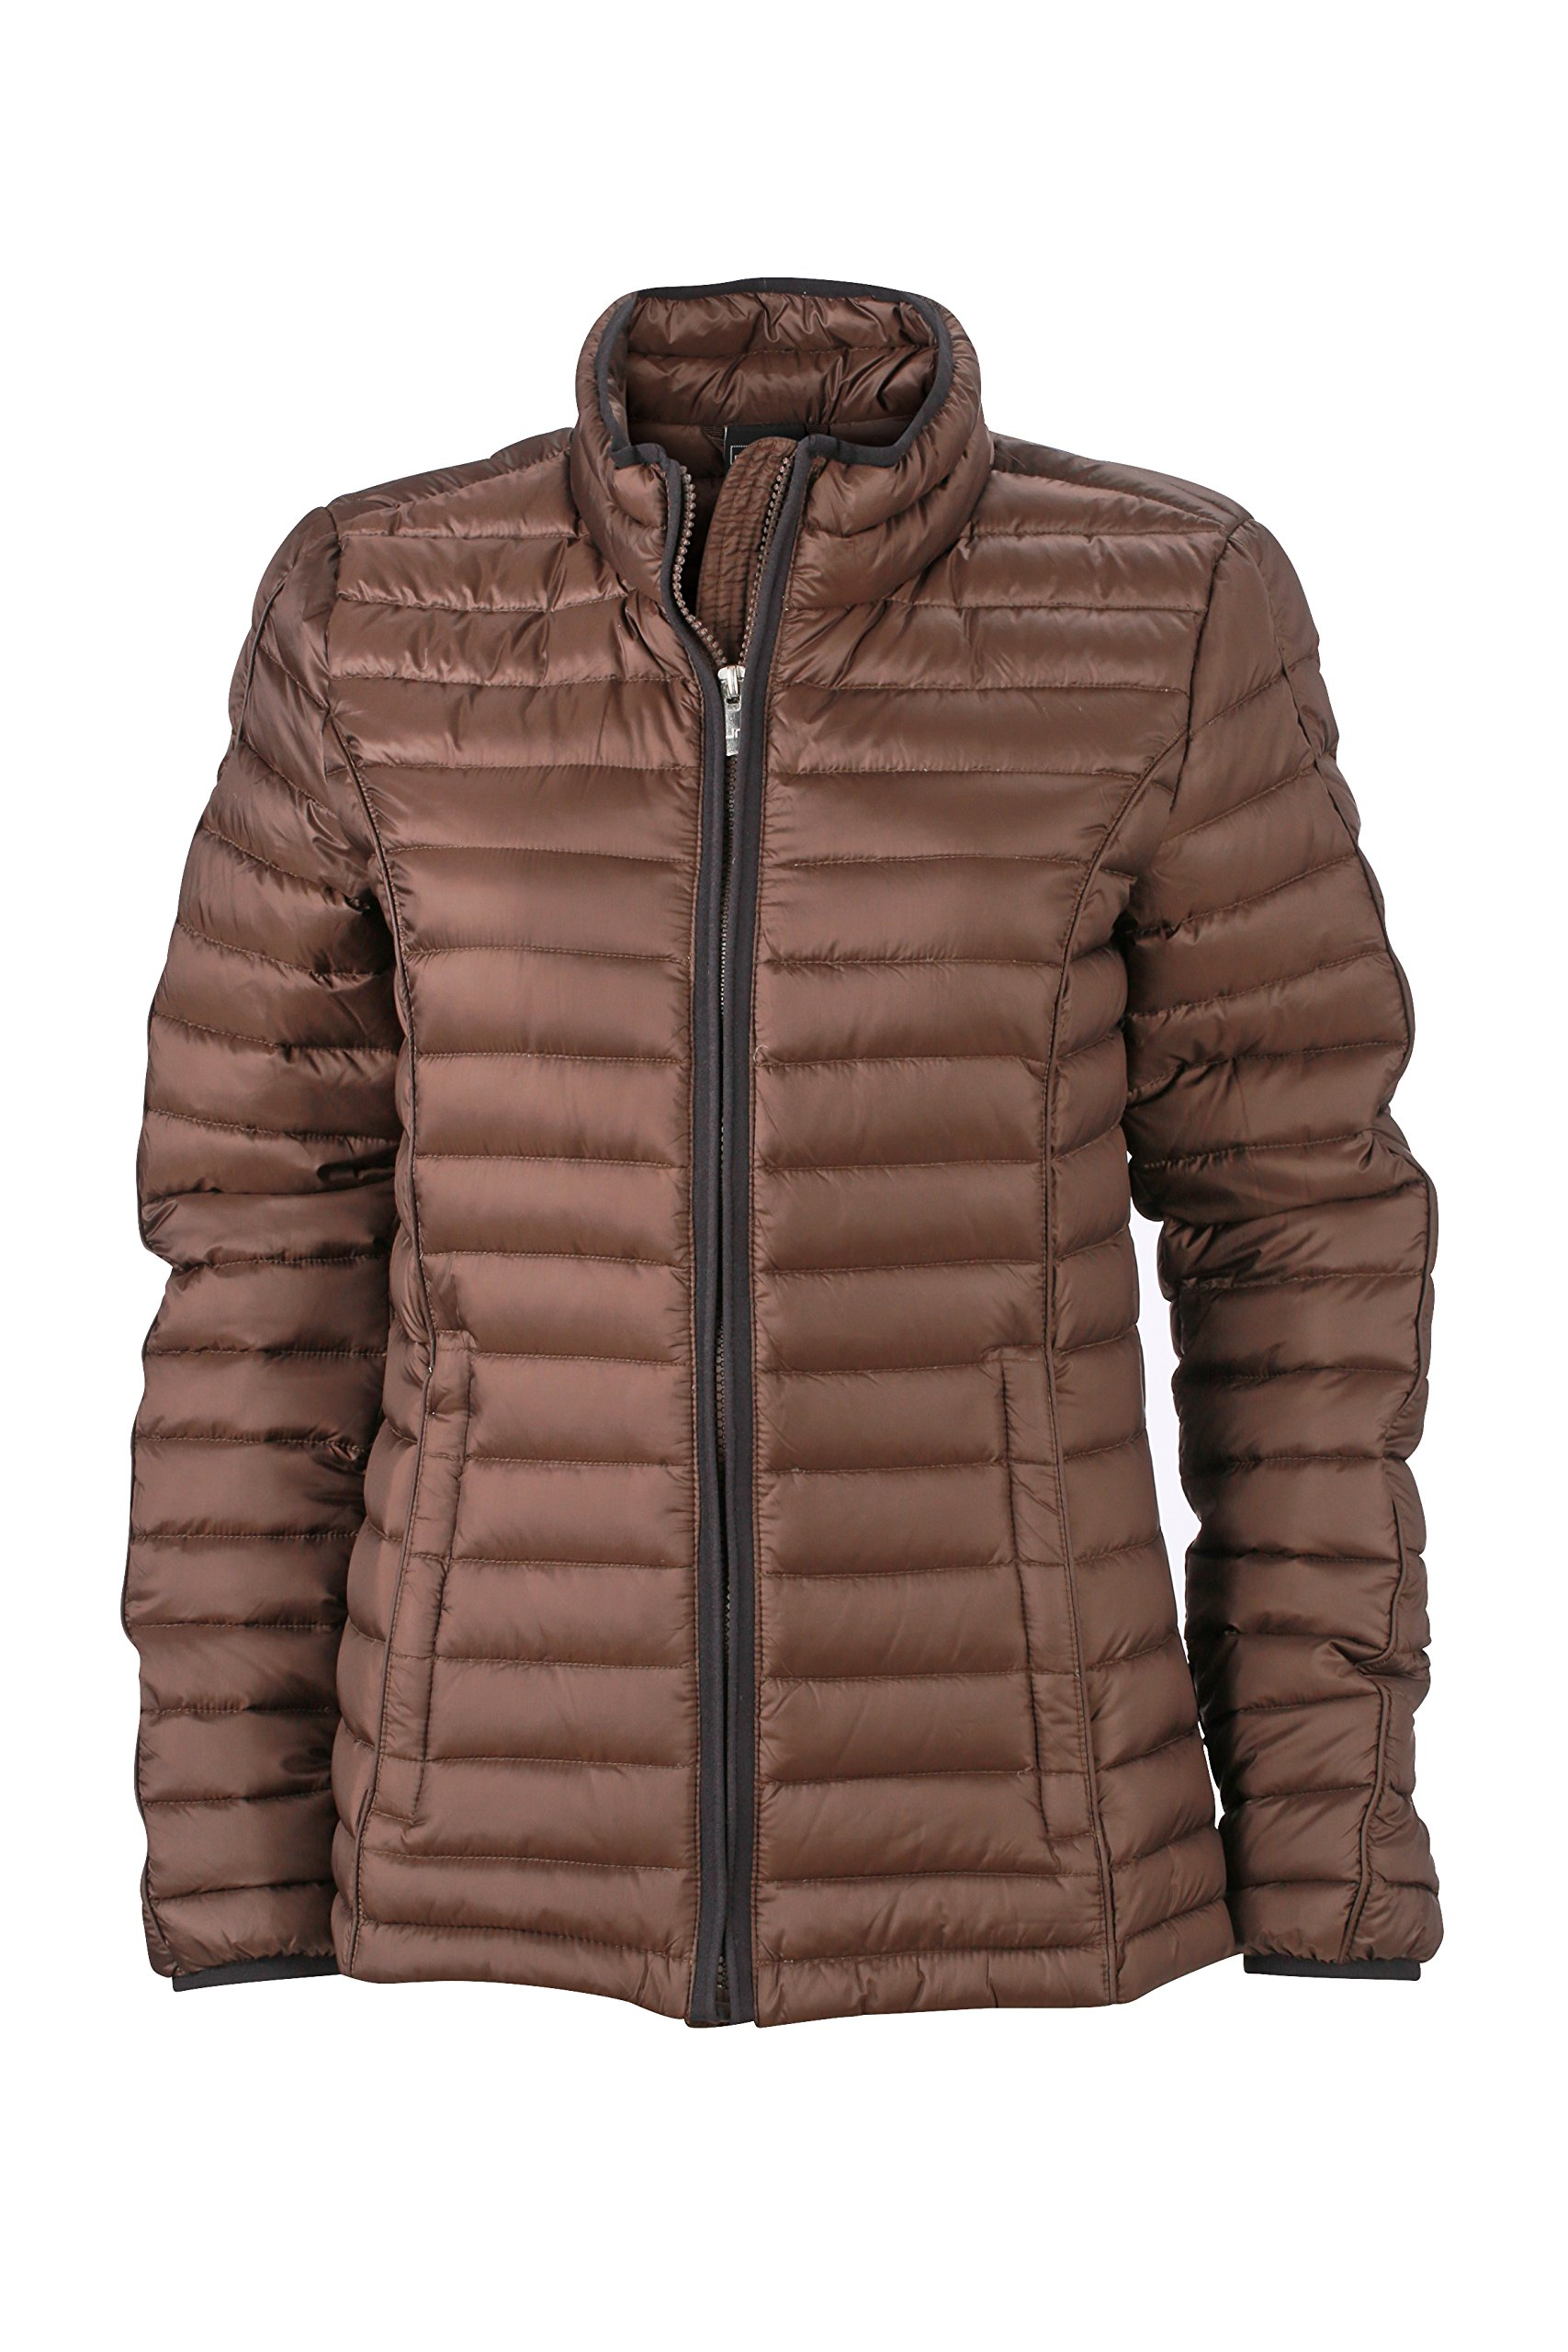 Quilted FabricantLarge Blouson Nicholson blackTaille Daunenjacke Jamesamp; Down Jacket Ladies FemmeMarroncoffee XiPkOZu